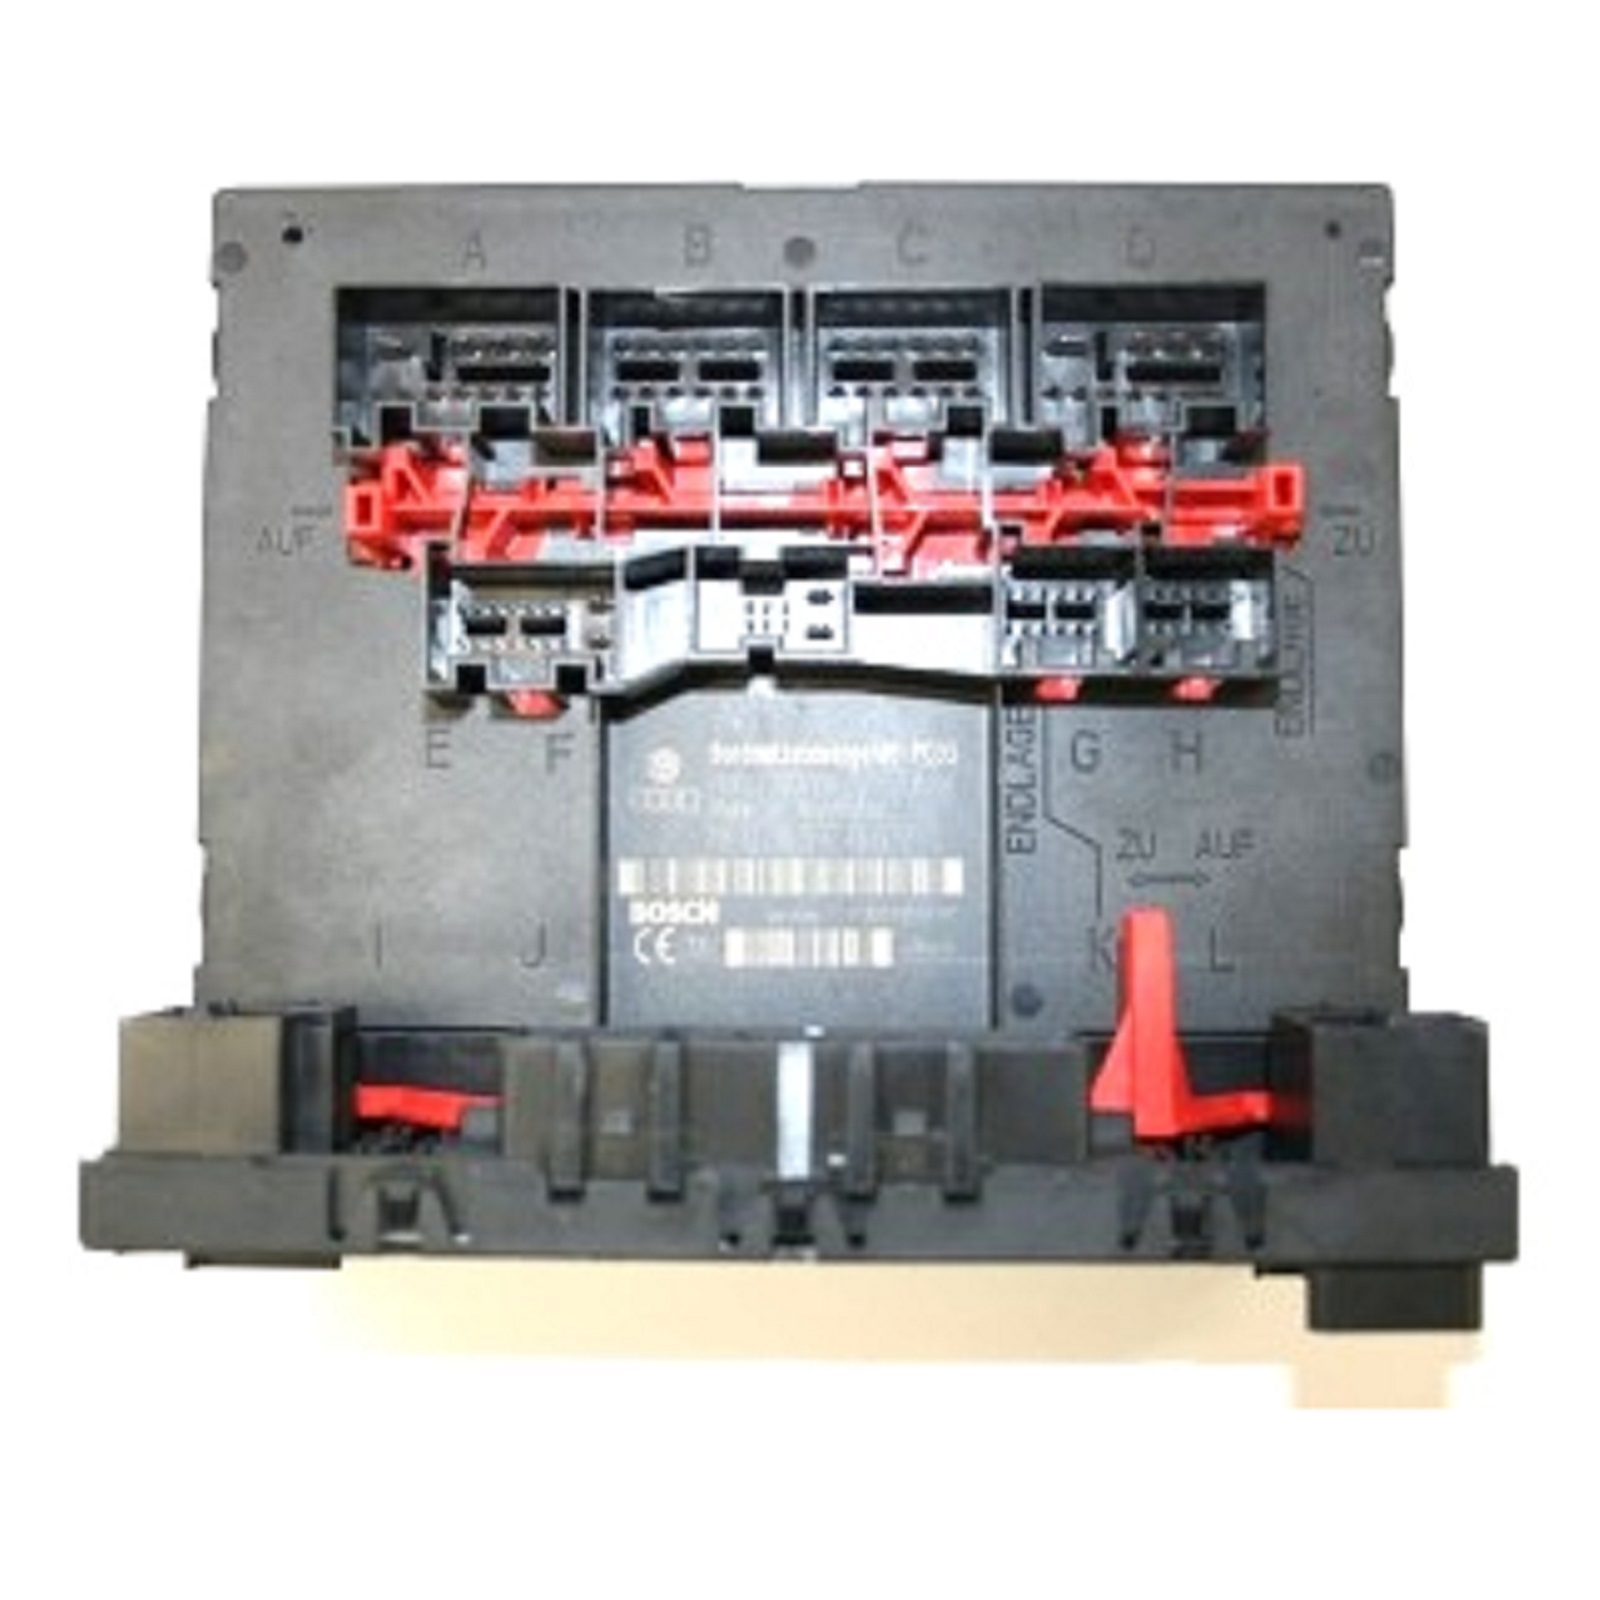 Used Genuine Vw Golf Central Control Module Fuse Box 1k0 937 049 T Box1599